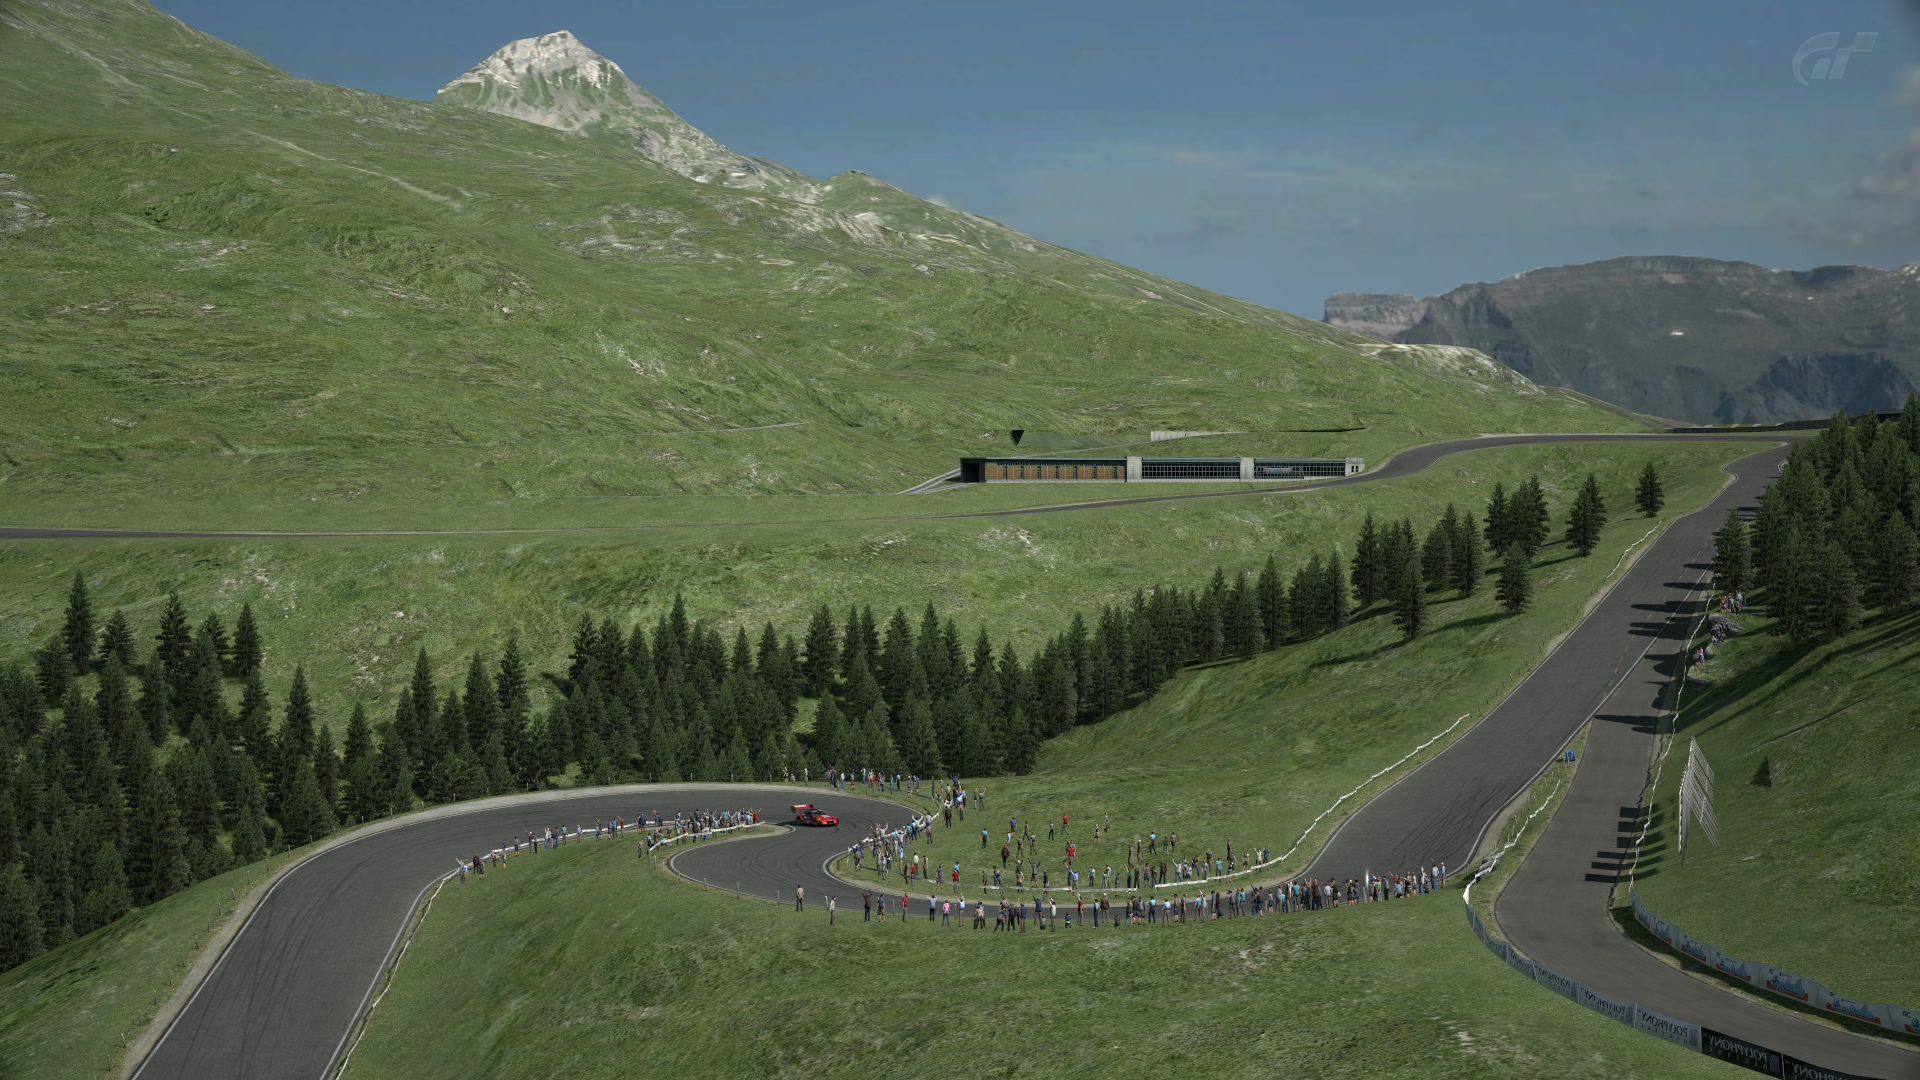 Eiger Nordwand - Circuito corto_4.jpg